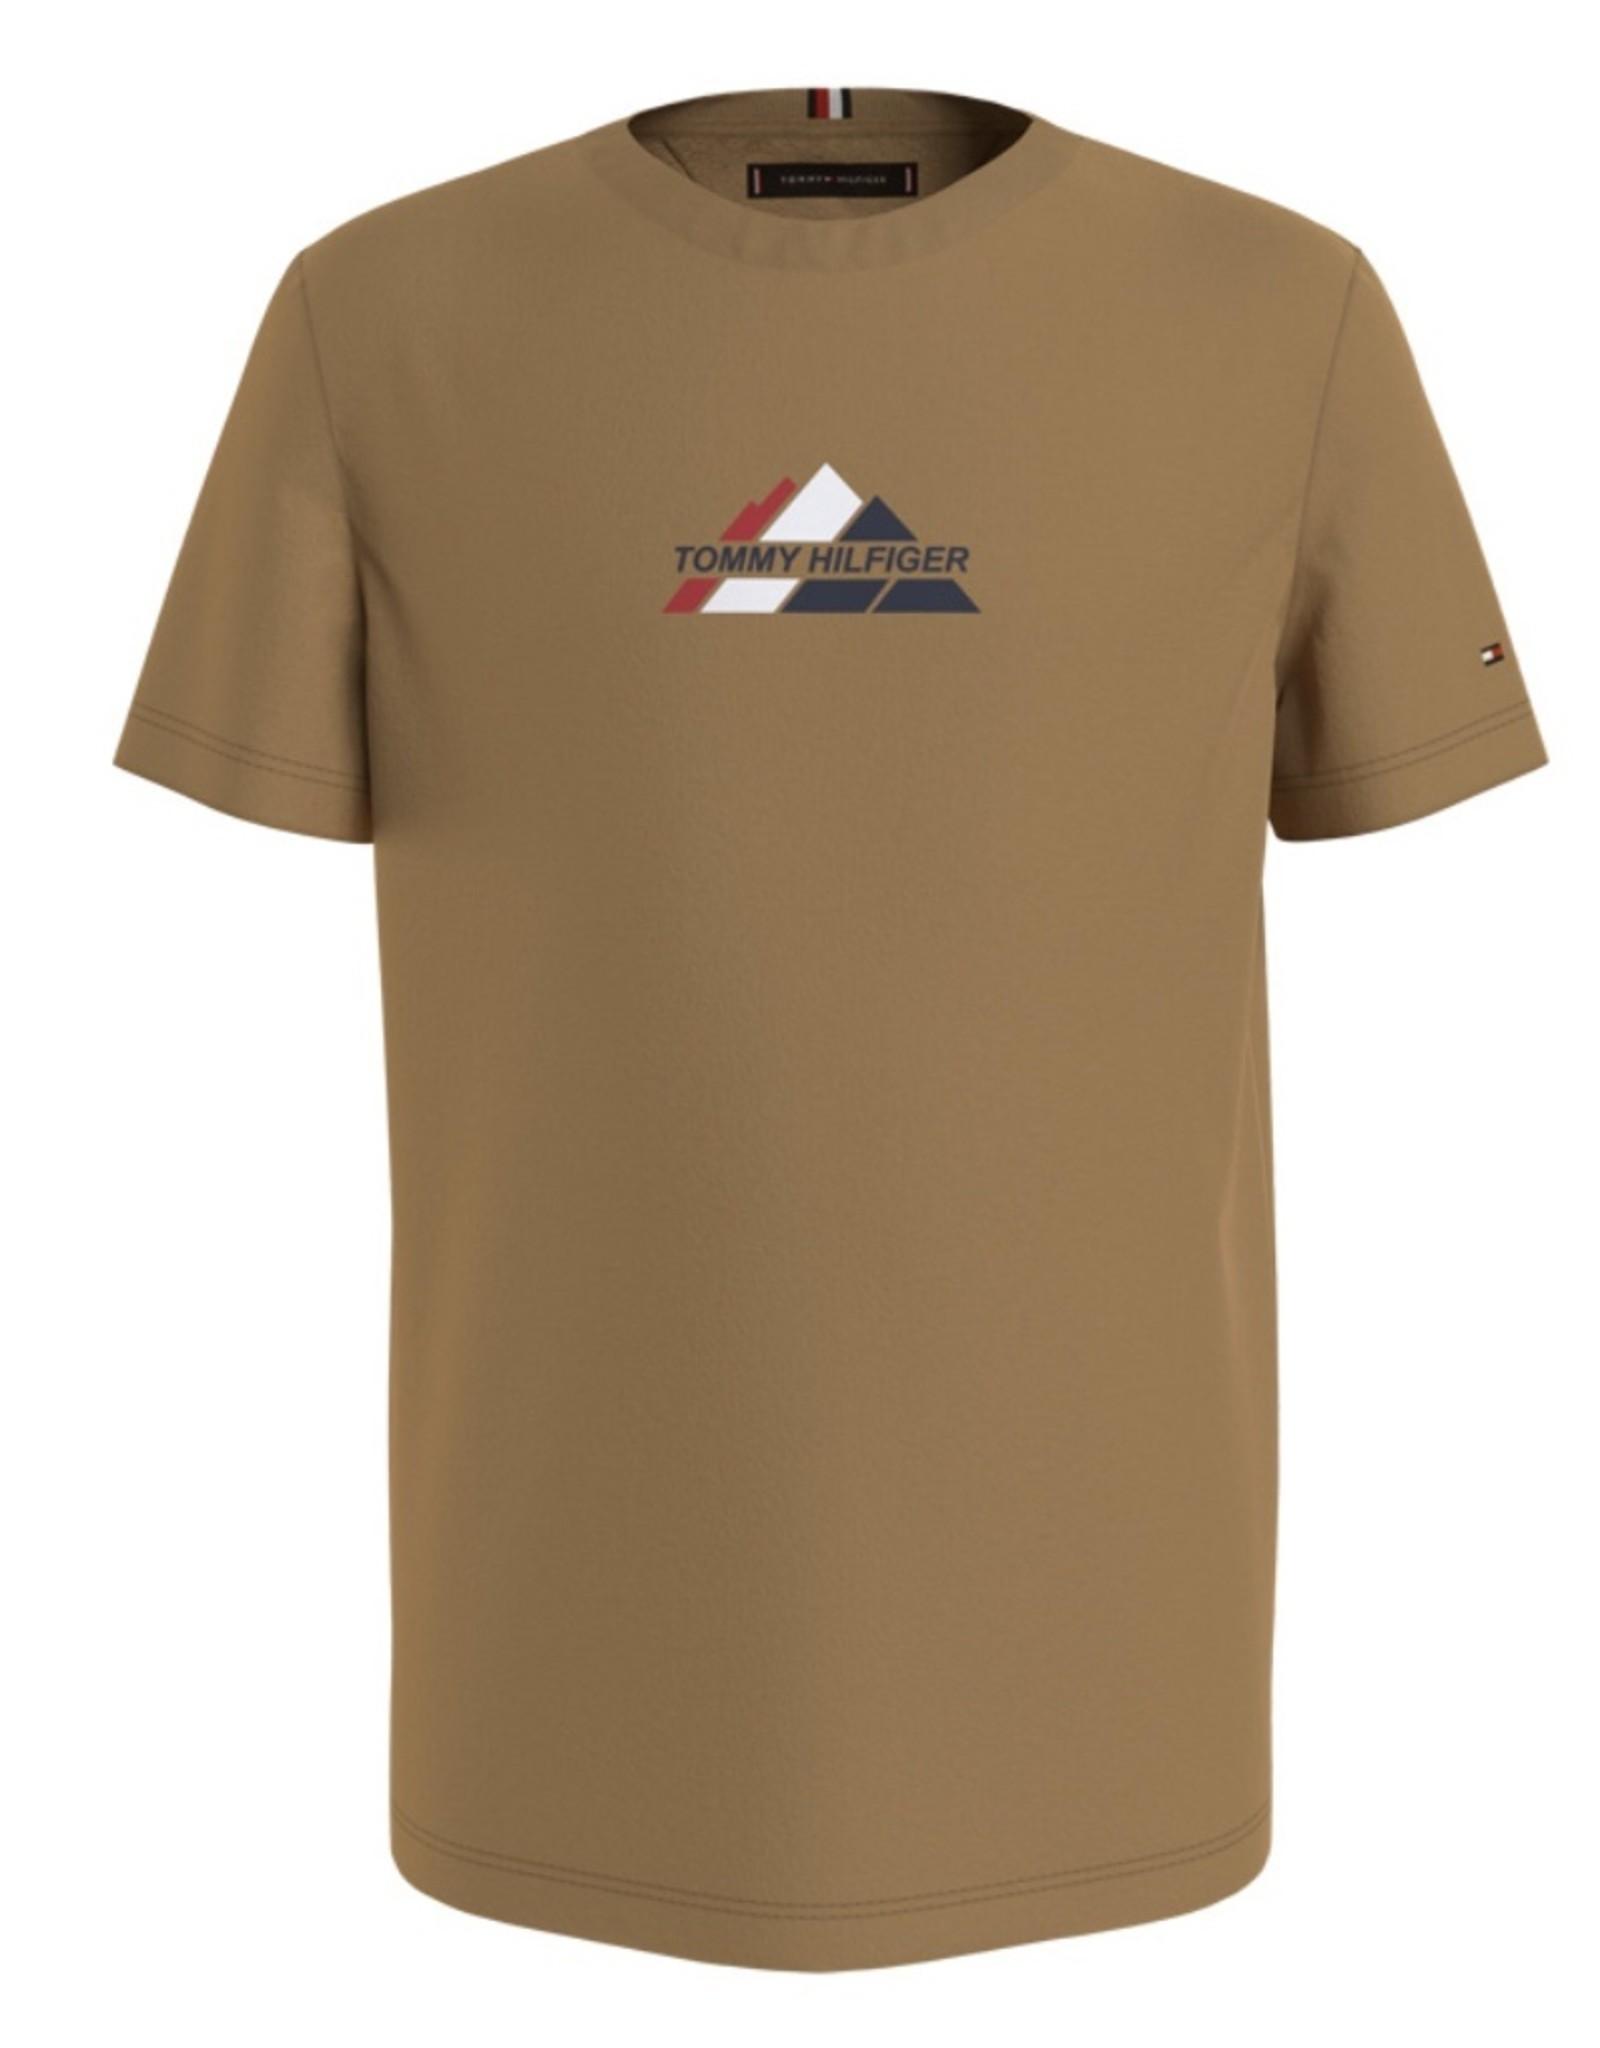 Tommy Hilfiger 6846 Logo T-Shirt